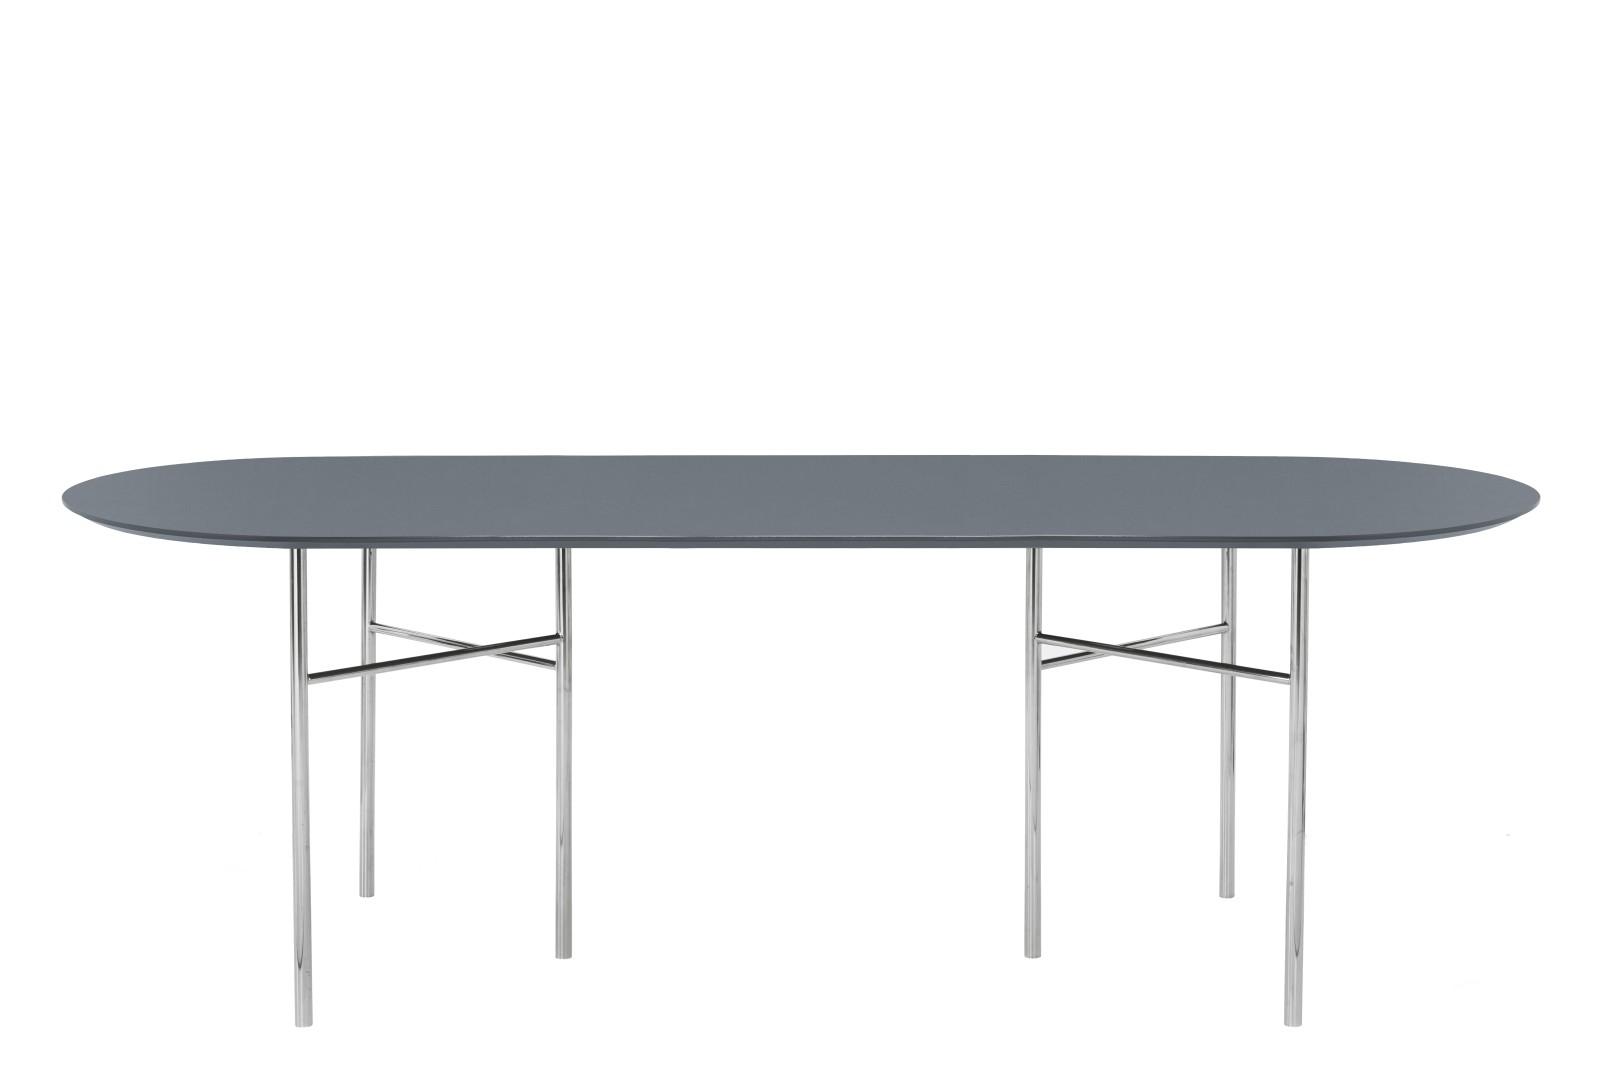 Mingle Oval Dining Table Dusty Blue Linoleum, Metal Chrome, 90 x 220cm